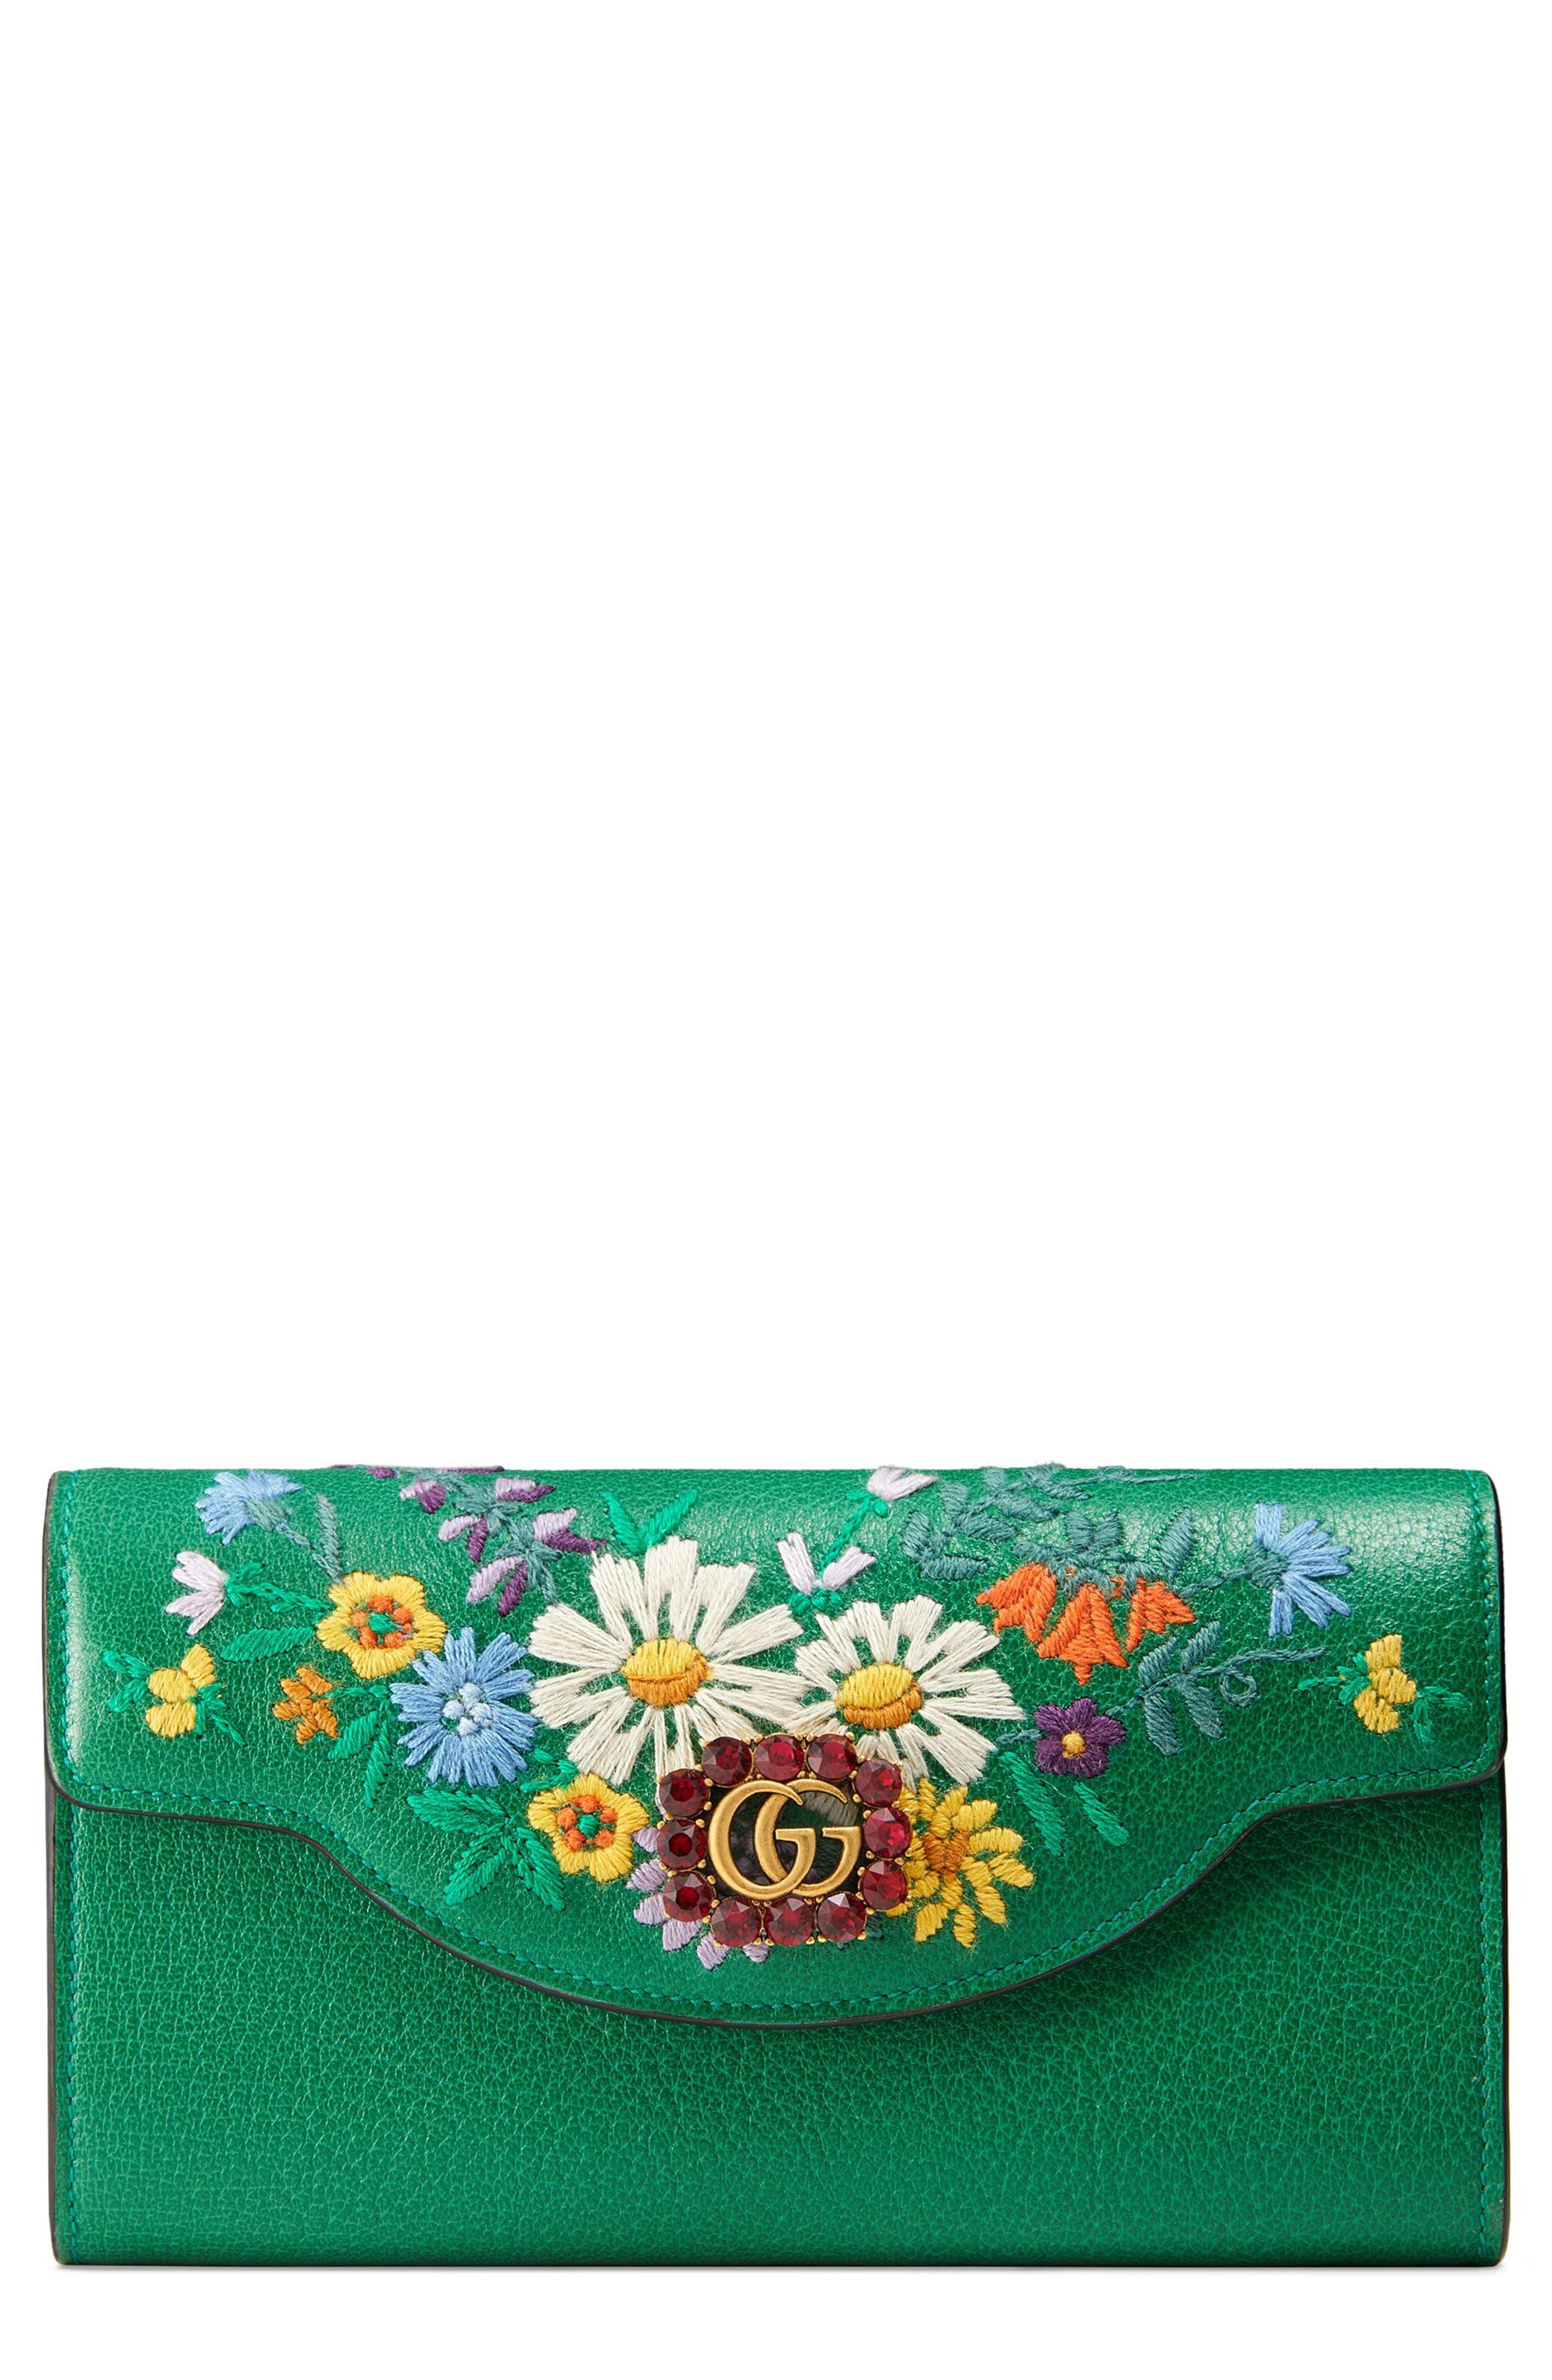 Gucci Ricamo Fiori Floral Embroidered Continental Wallet